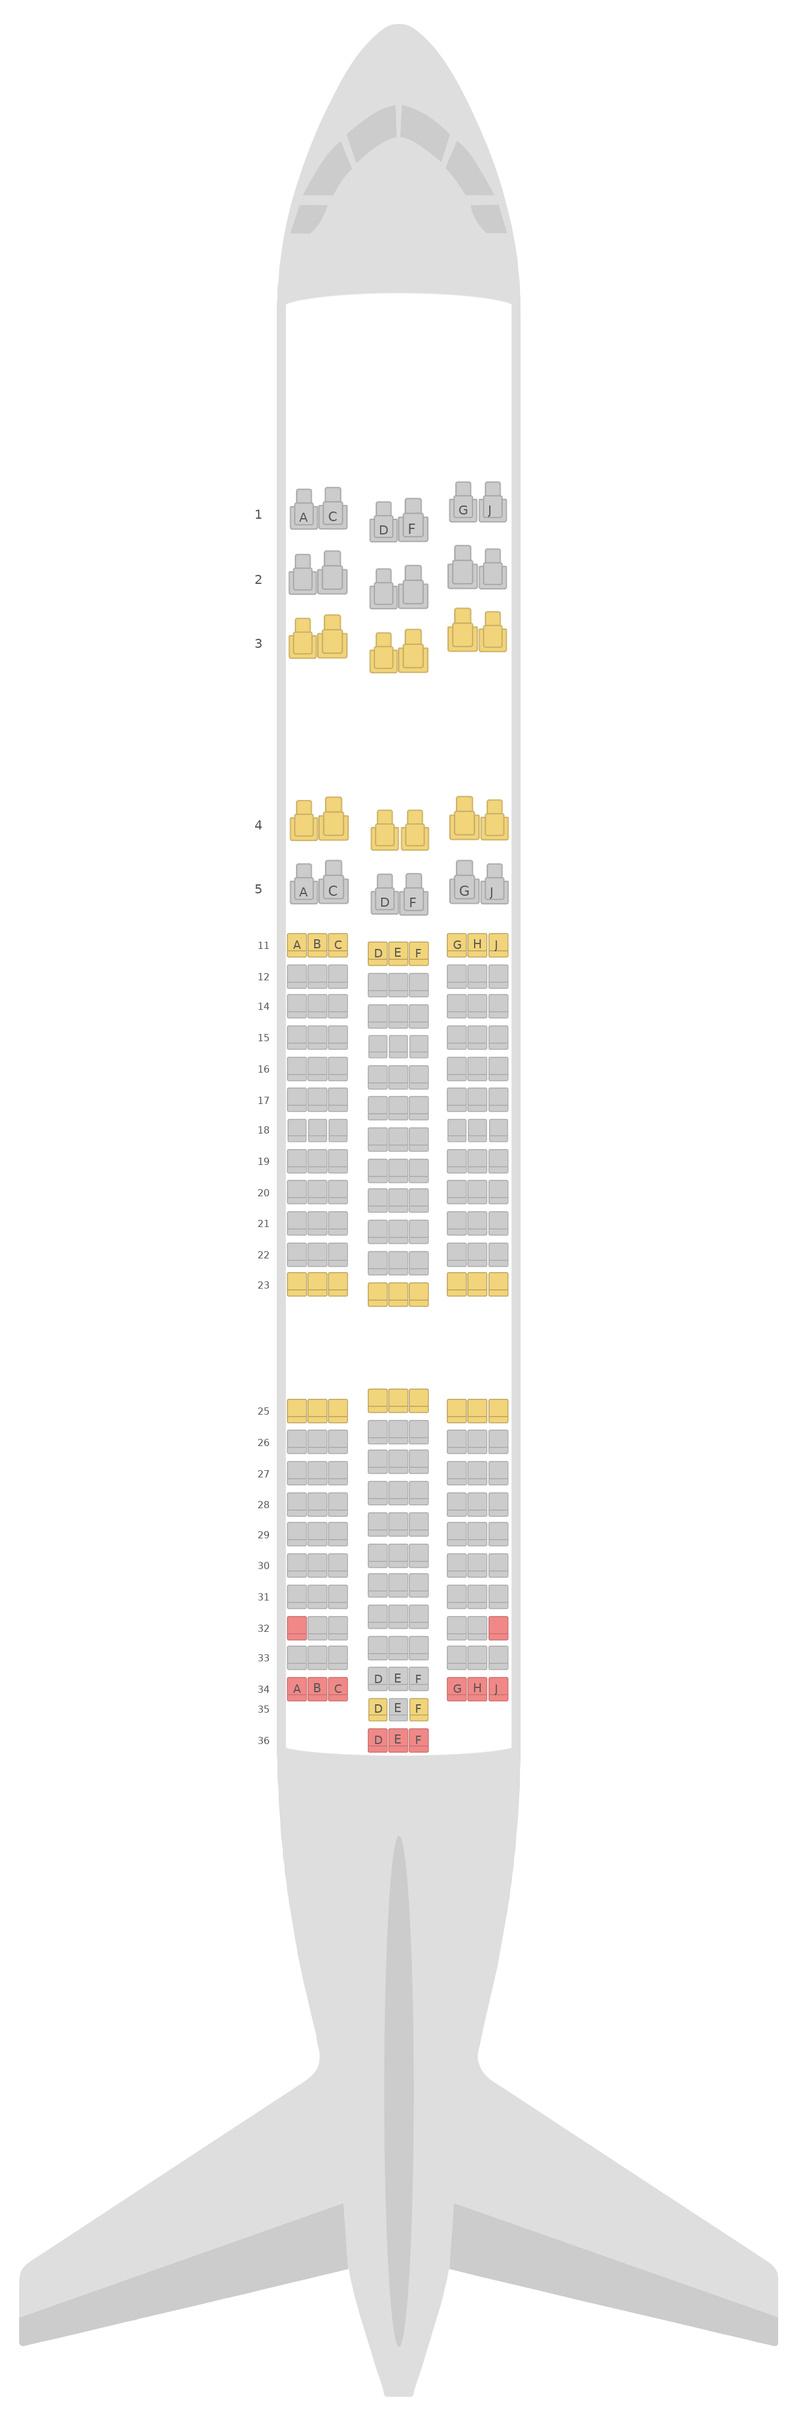 Схема салона Боинг 787-8 (788) Кенийские авиалинии